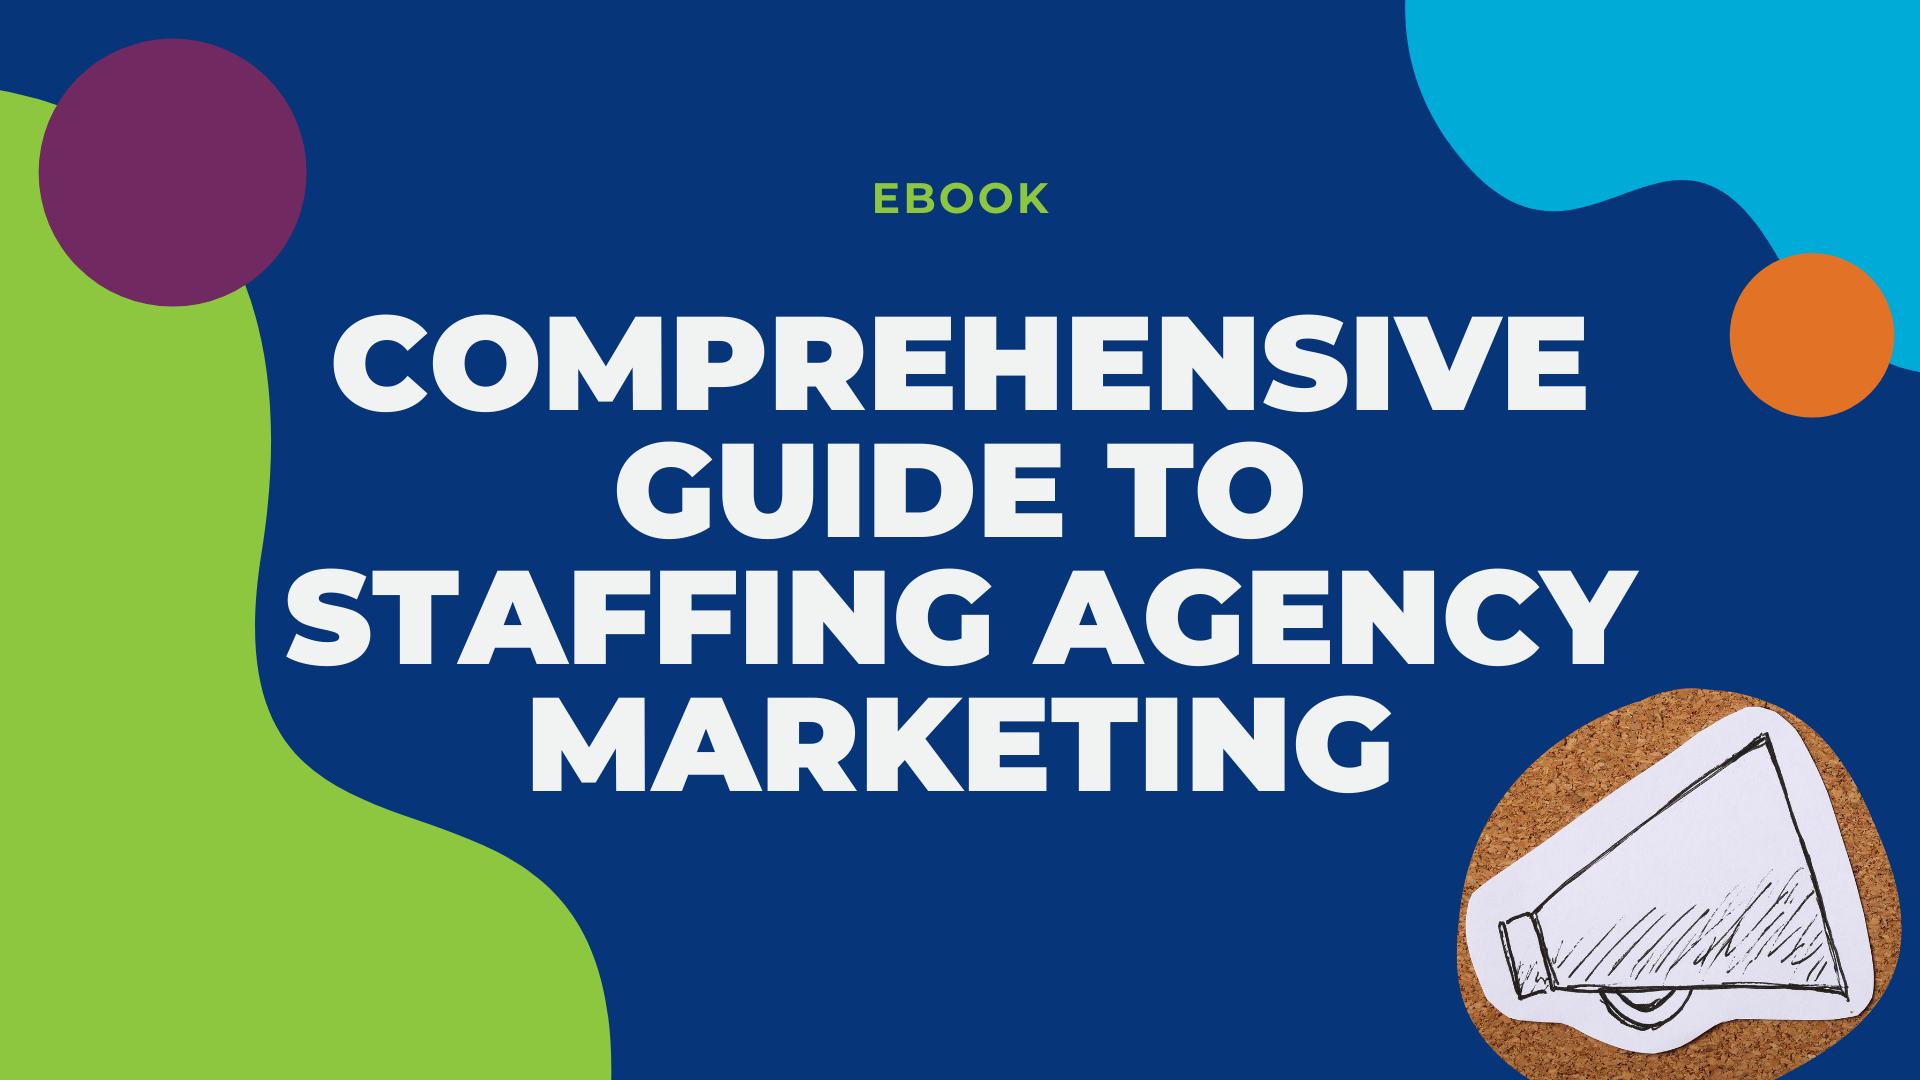 LG2 Website Resource - staffing agency marketing ebook